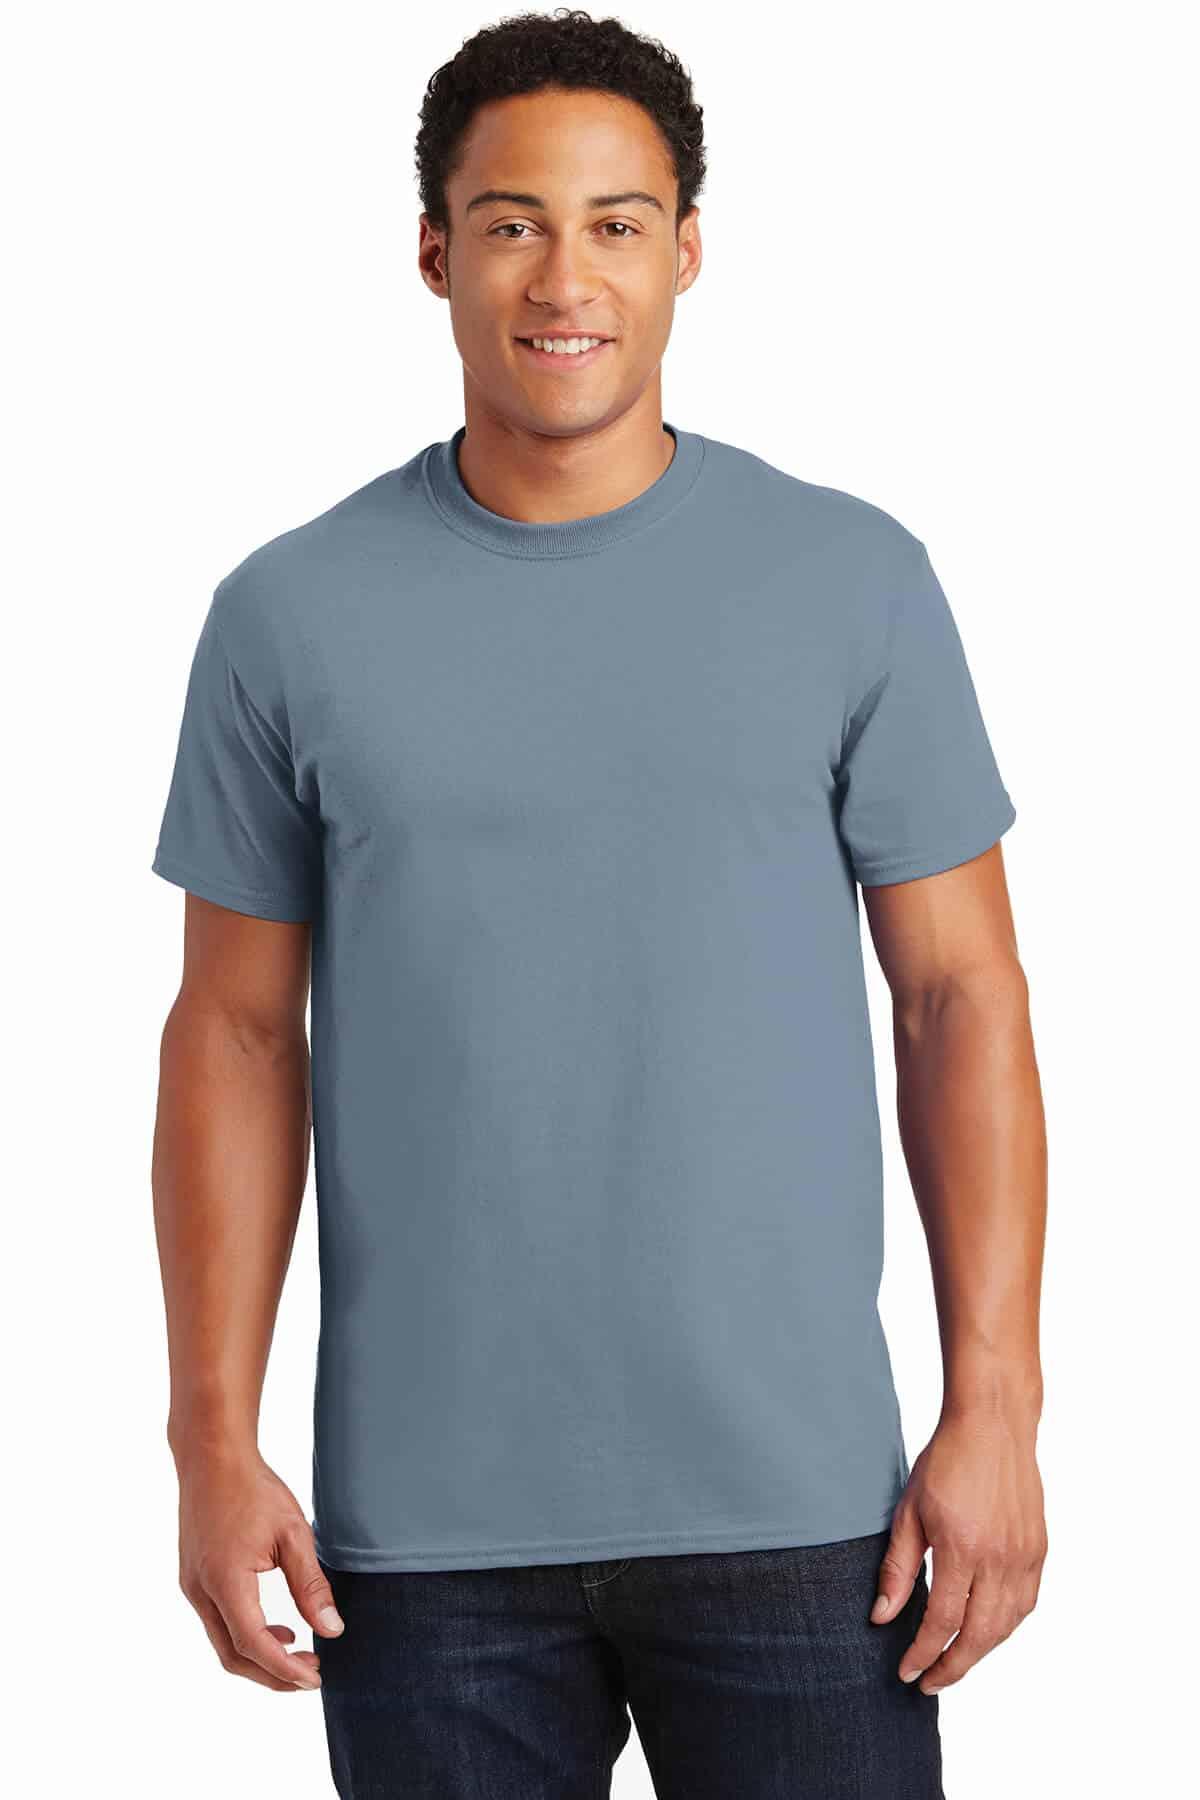 Stone Blue Teeshirt Front